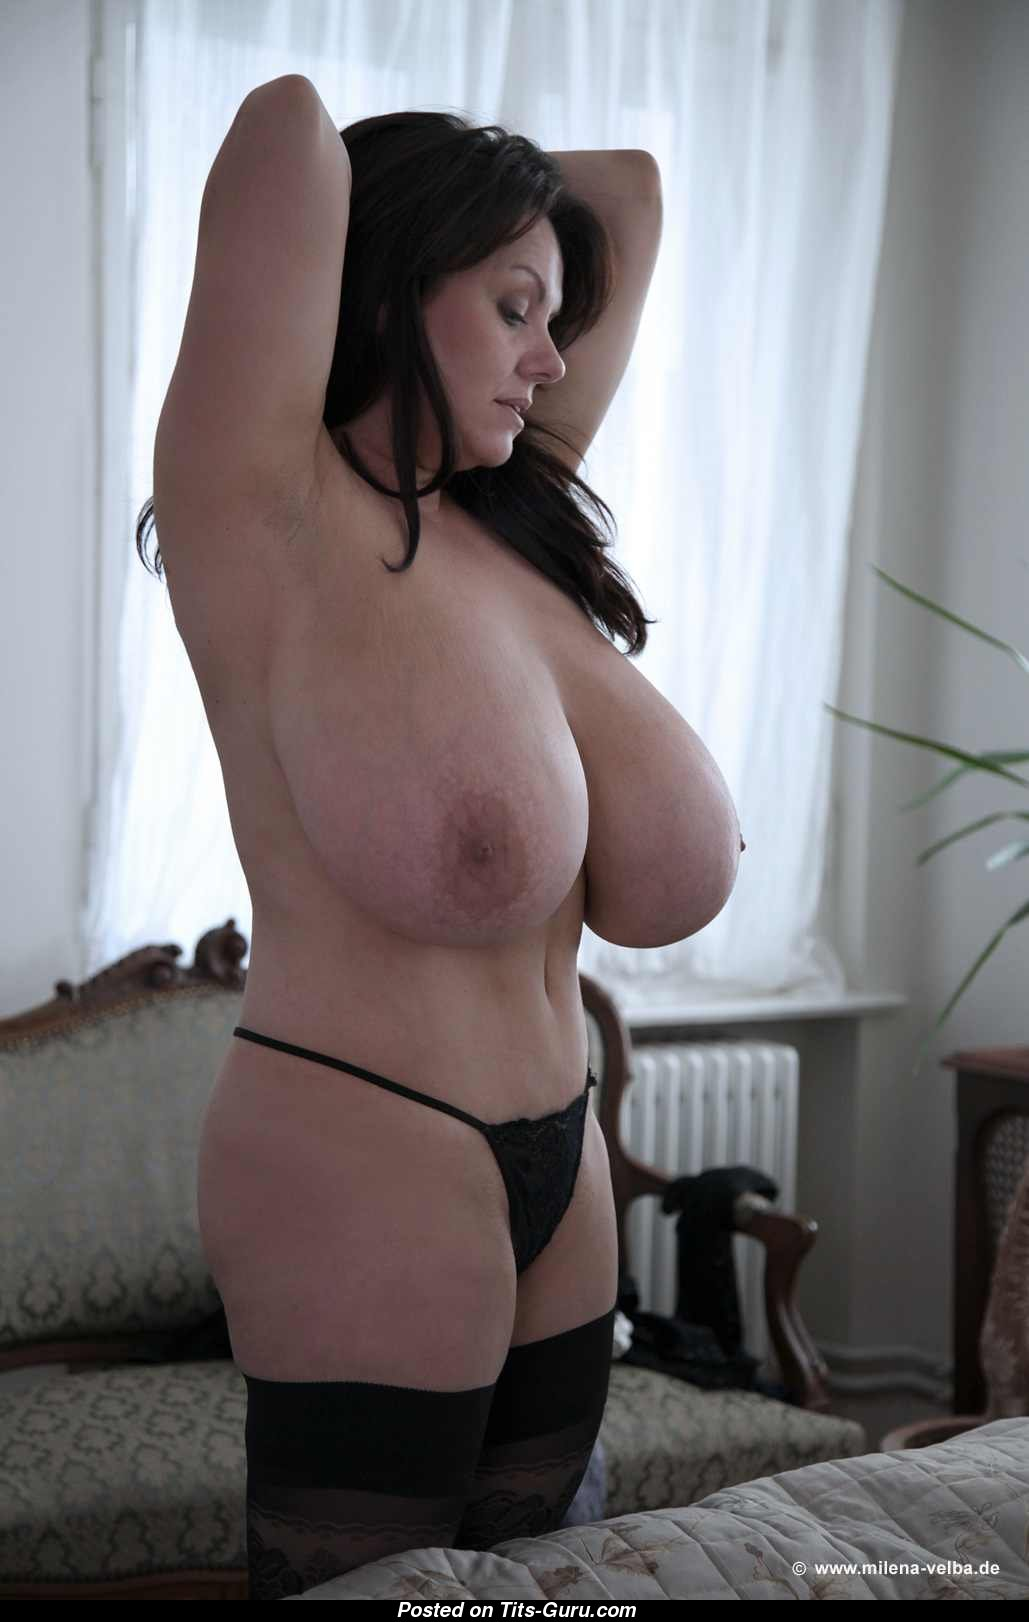 Teen mom farrah abraham nude